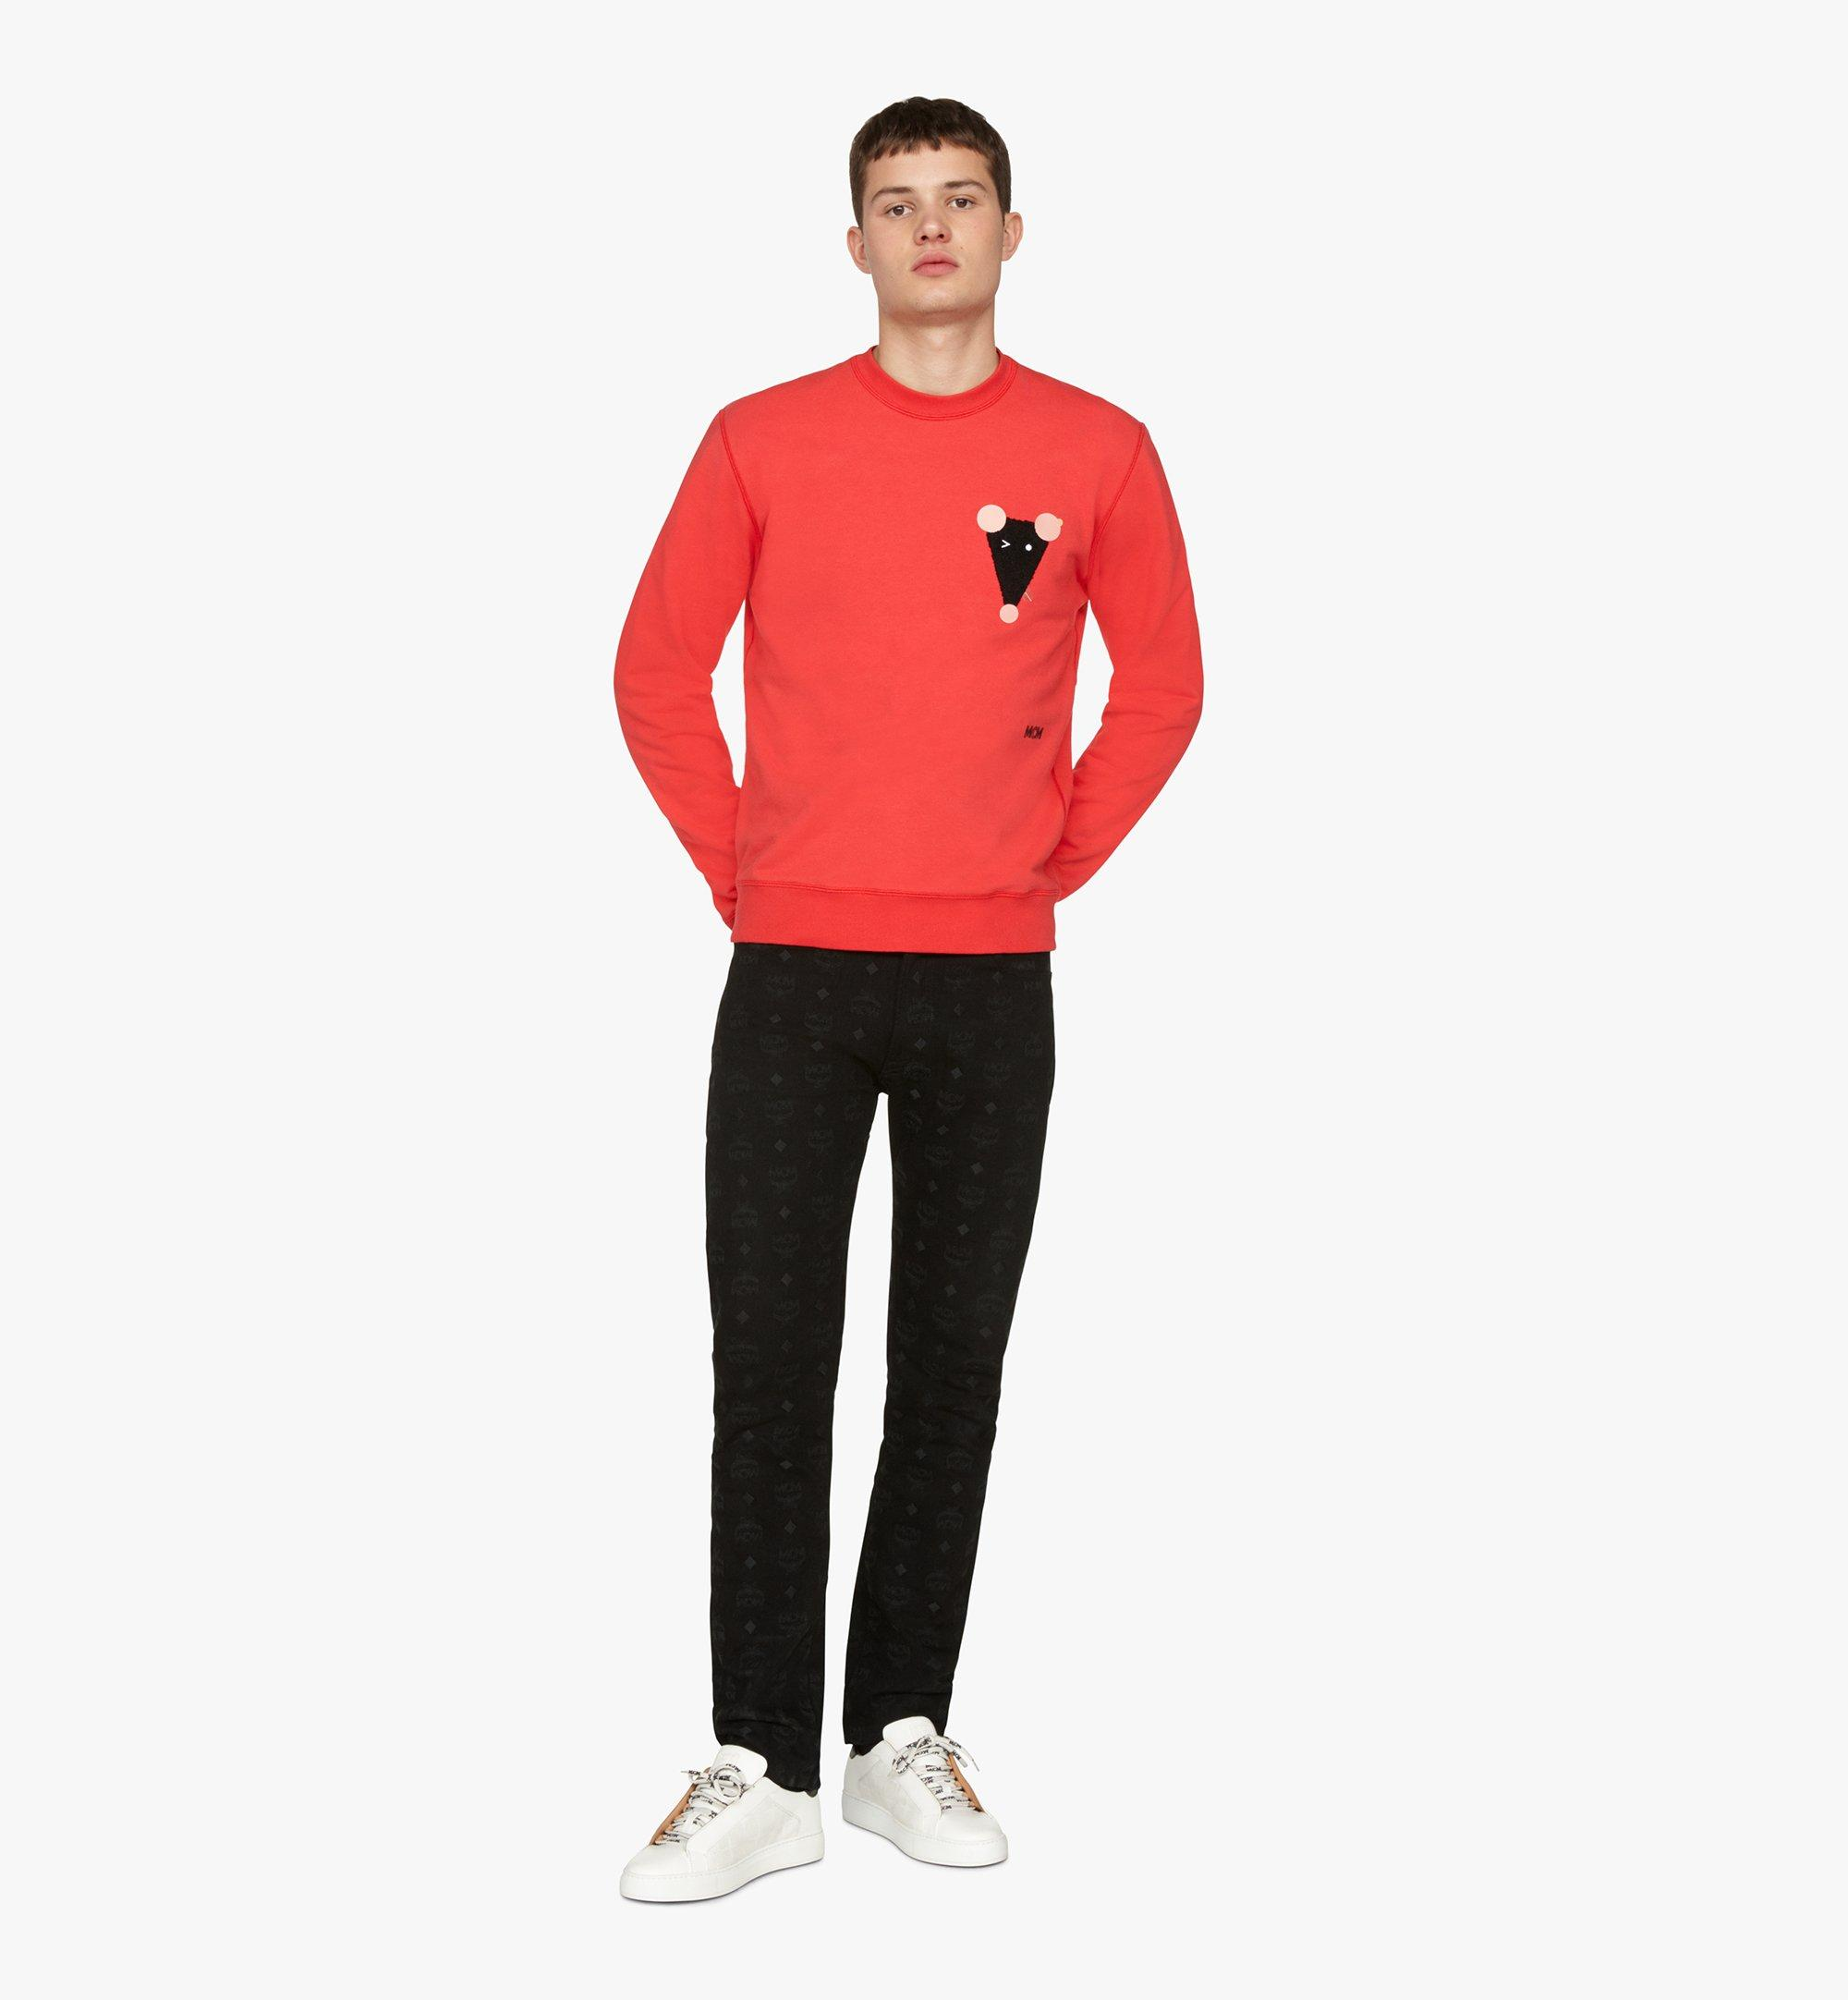 MCM Men's Year Of The Mouse Mockneck Sweatshirt Red MHAASSE02R400L Alternate View 2